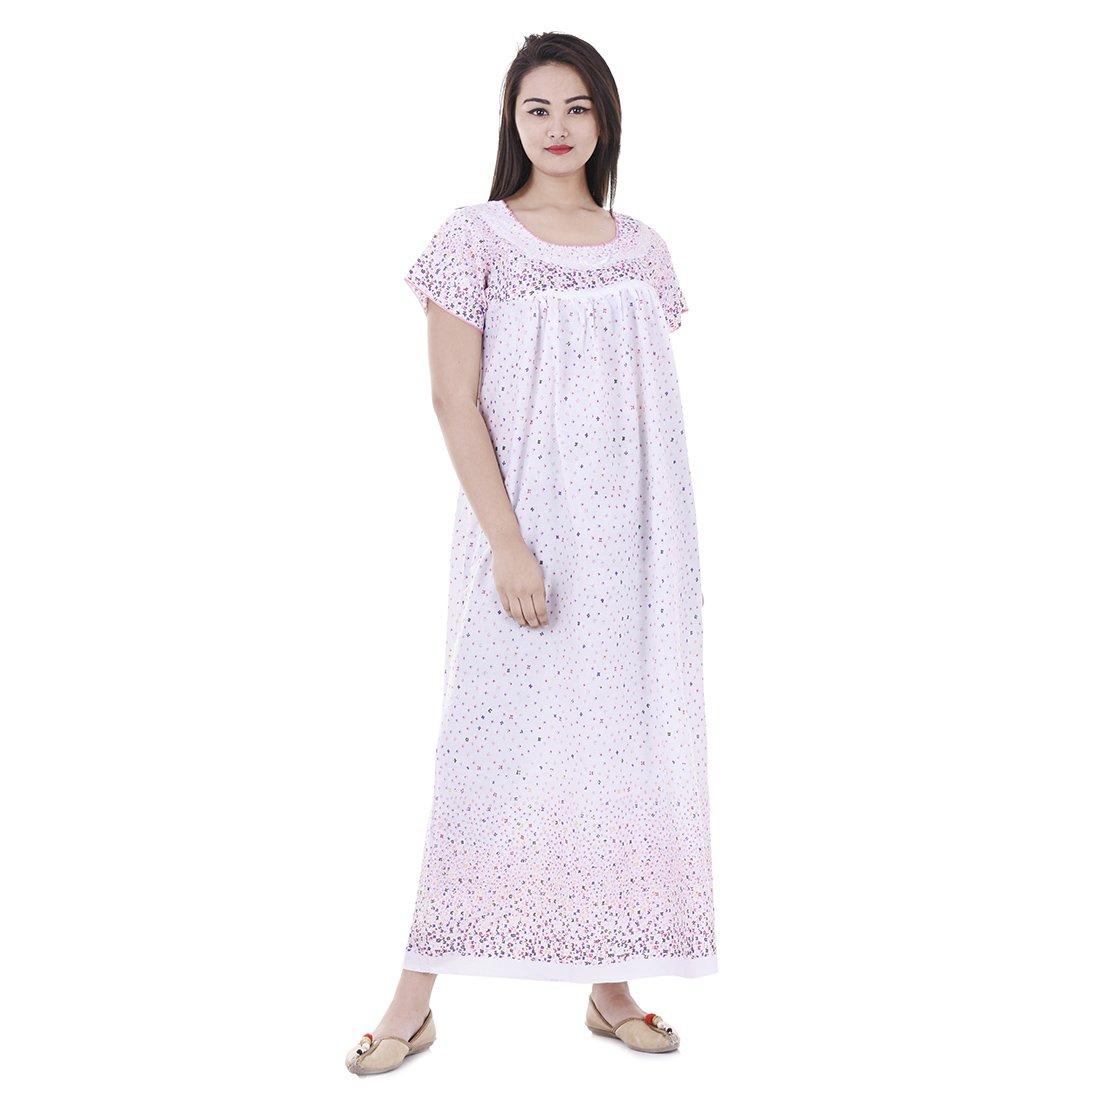 Amazon.com  Women Cotton Night Wear Gown Sexy Nighties Nighty Sleepwear  Indian Dress Long Skirt Maxi Bath Robe Nightdress  Clothing 95eca5452